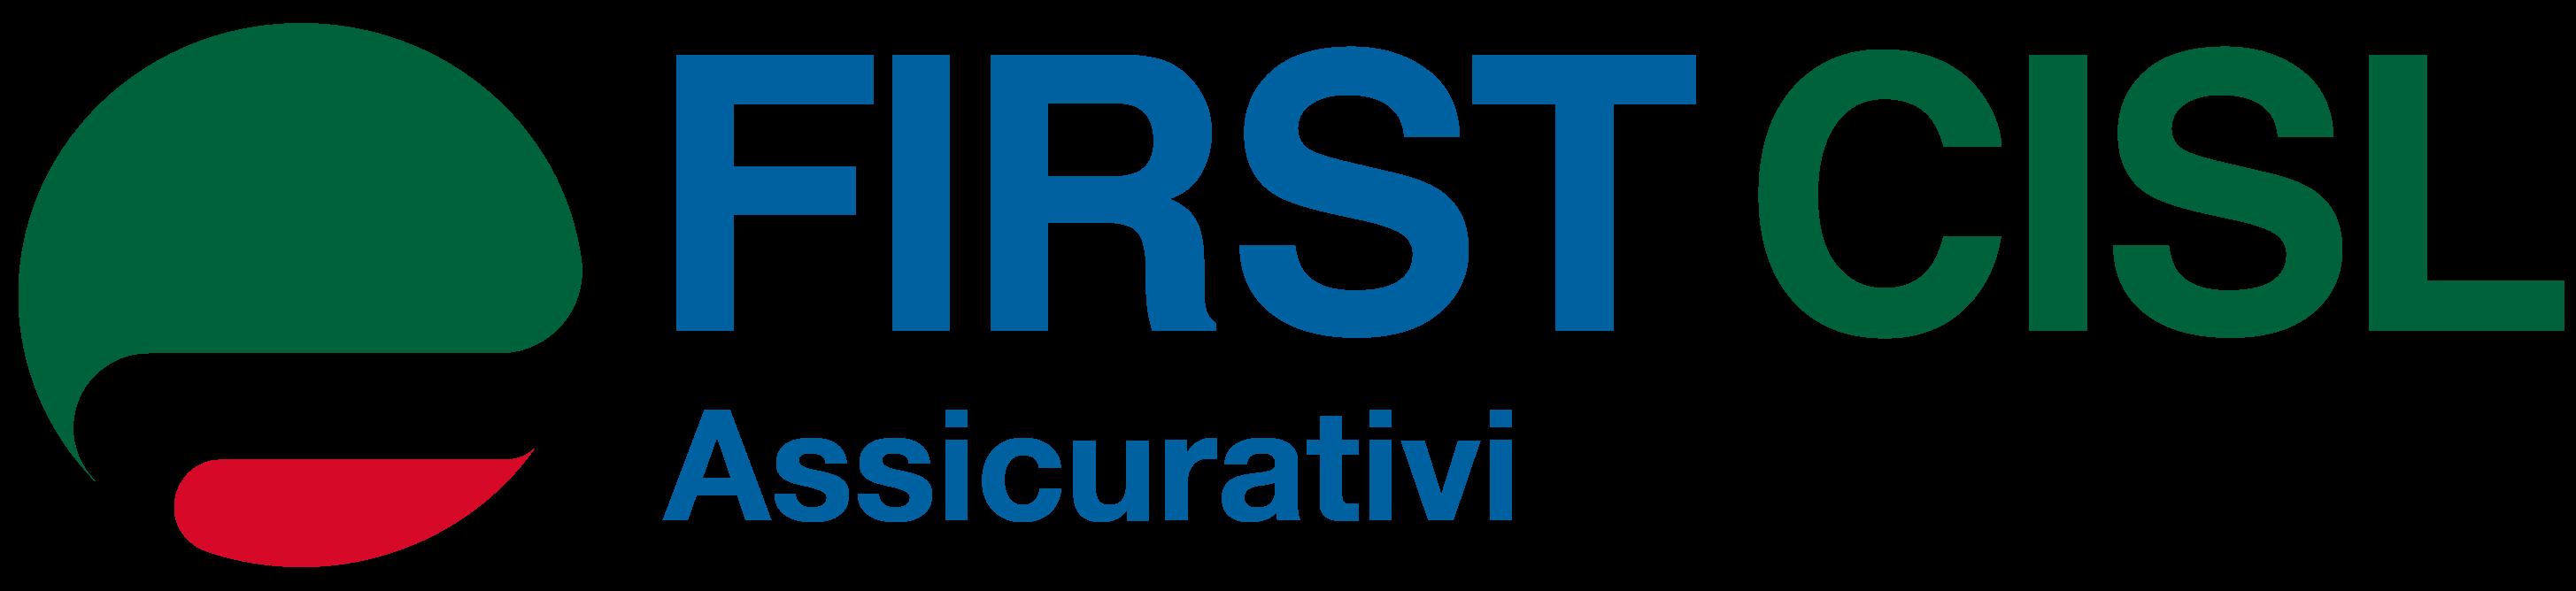 FIRST CISL Assicurativi